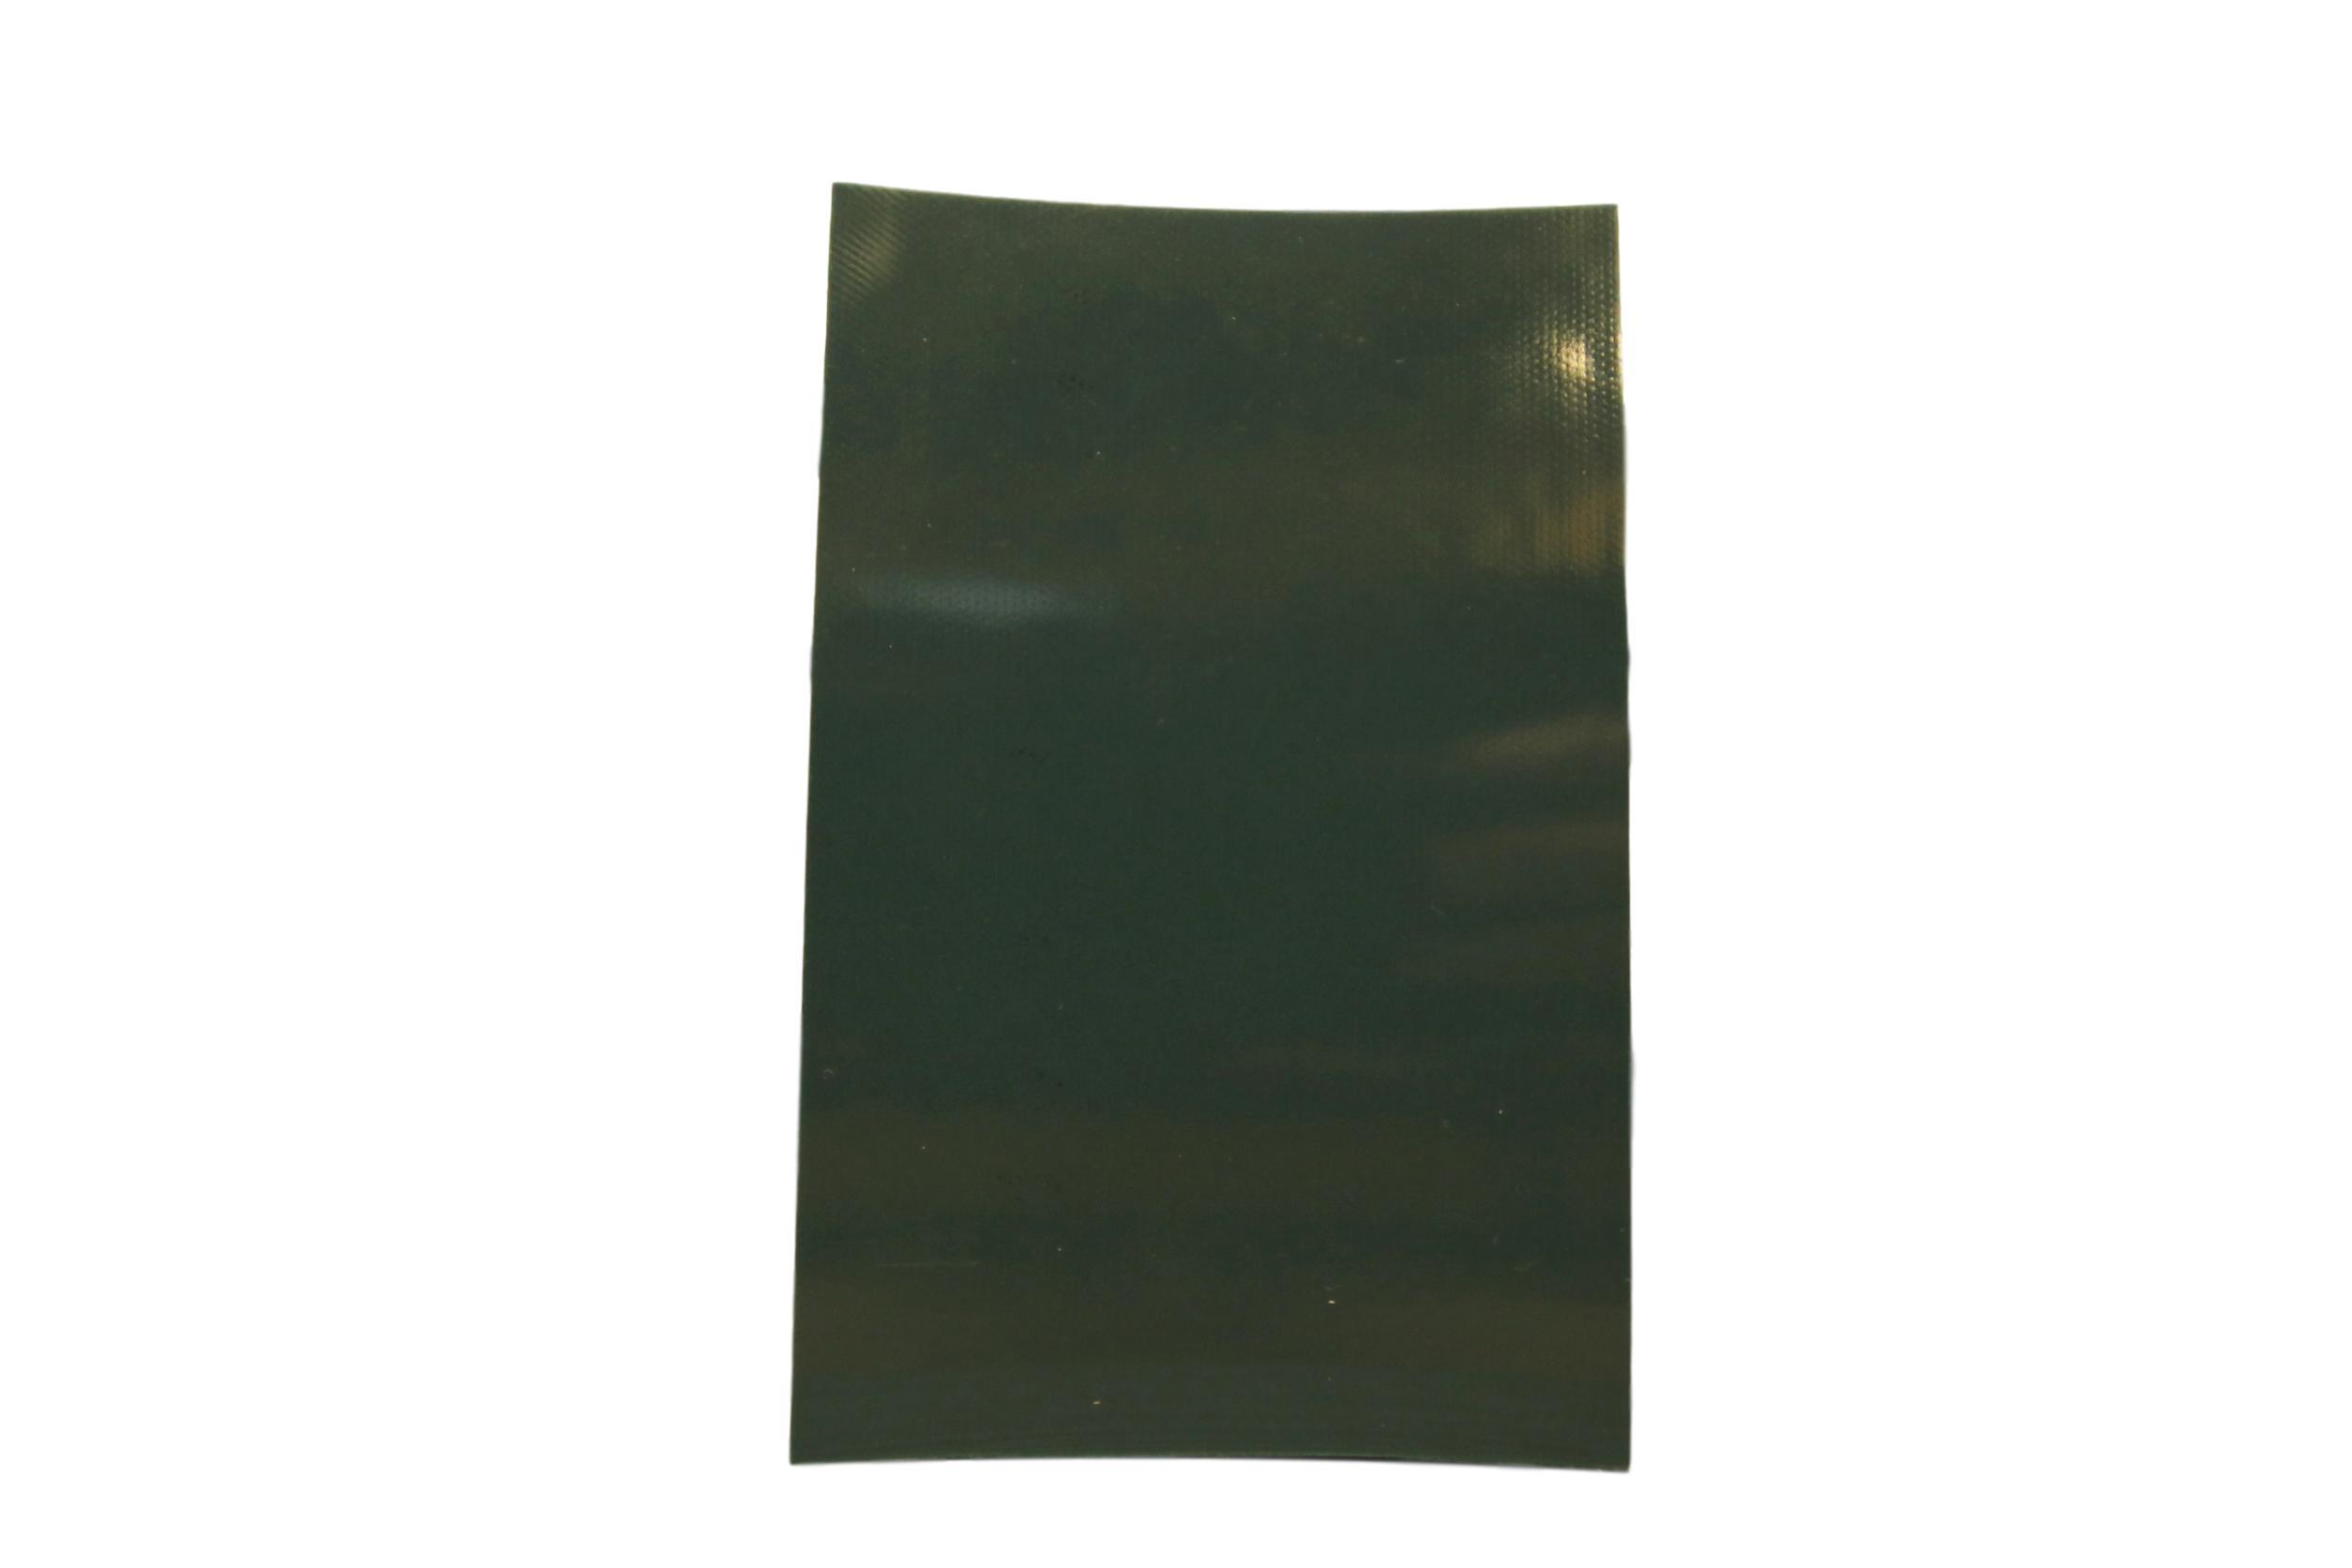 Conveyor Belting Petrol Green 3 PVC 3 PLY Fabric Base Rigid 5.0mm